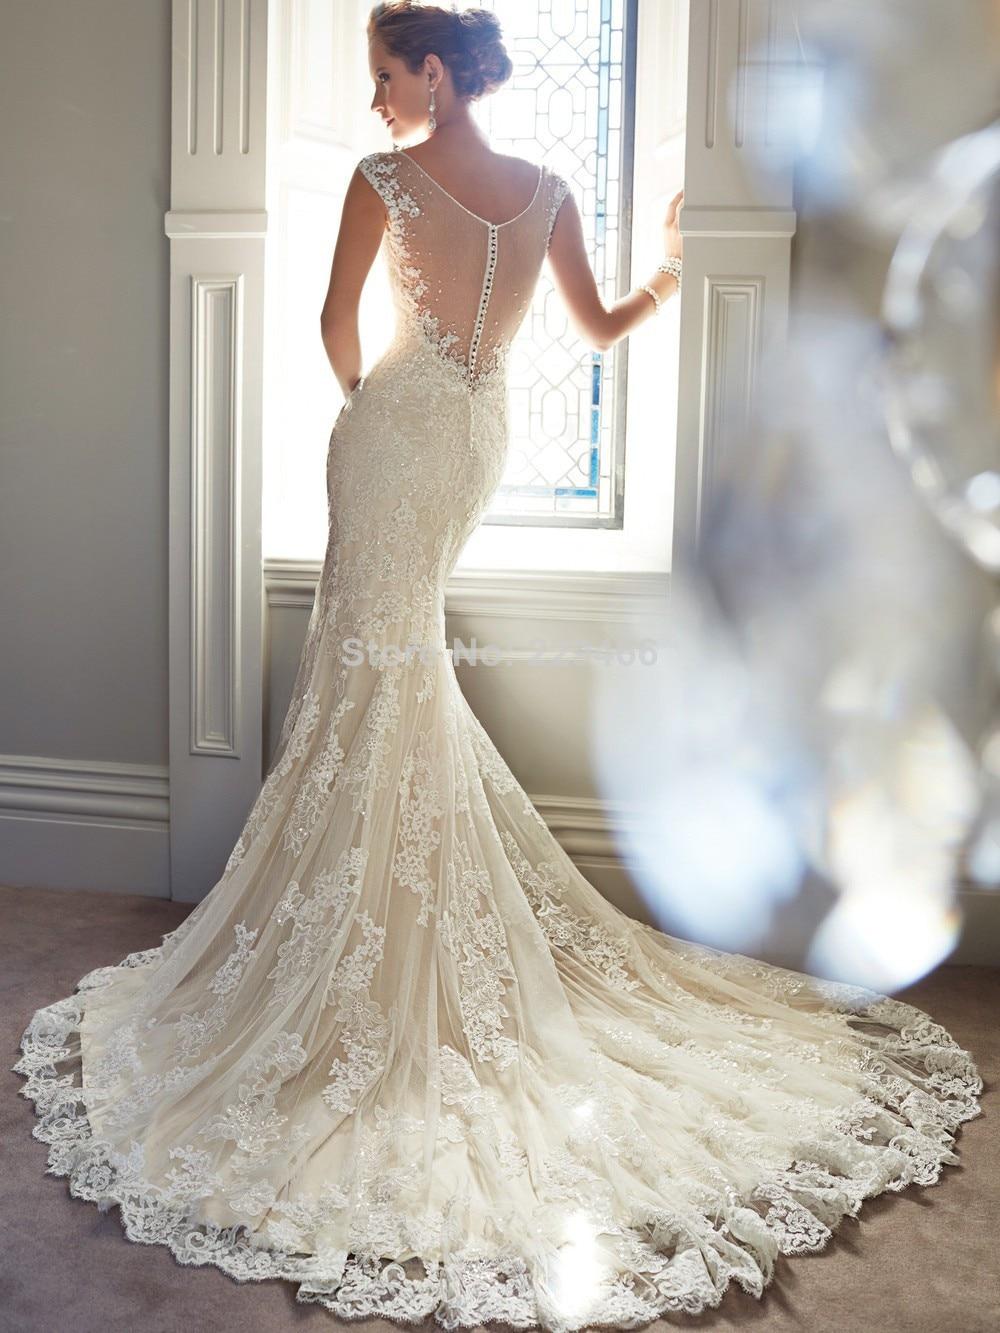 Ss97 cap sleeve lace ivory mermaid wedding dresses backless ss97 cap sleeve lace ivory mermaid wedding dresses backless wedding dress vintage vestido noiva sereia junglespirit Gallery